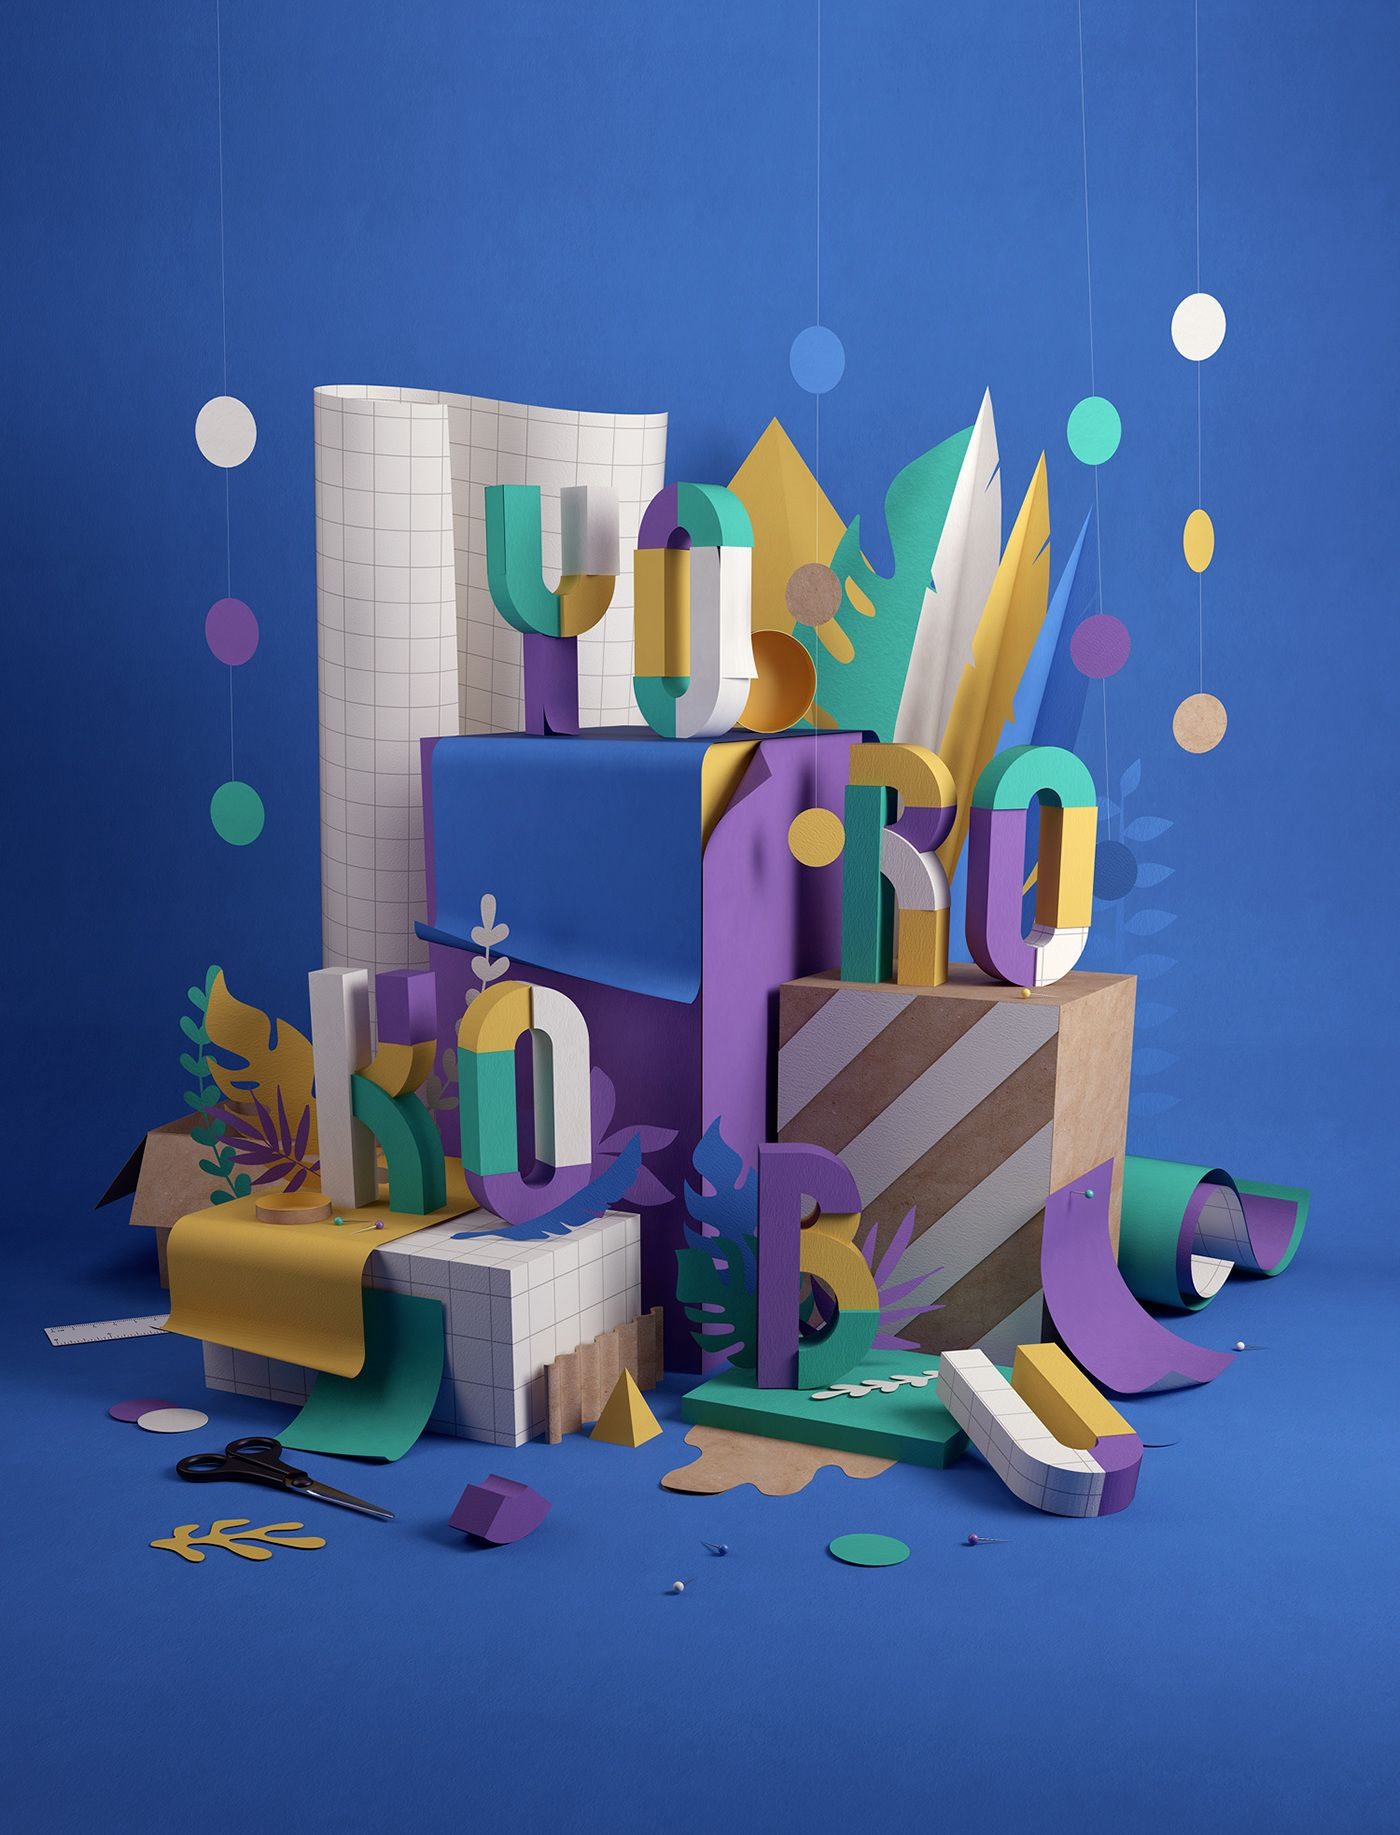 Yorokobu Cover On Behance Future Home Pinterest Behance D - Amazing 3d artwork dani aristizabal